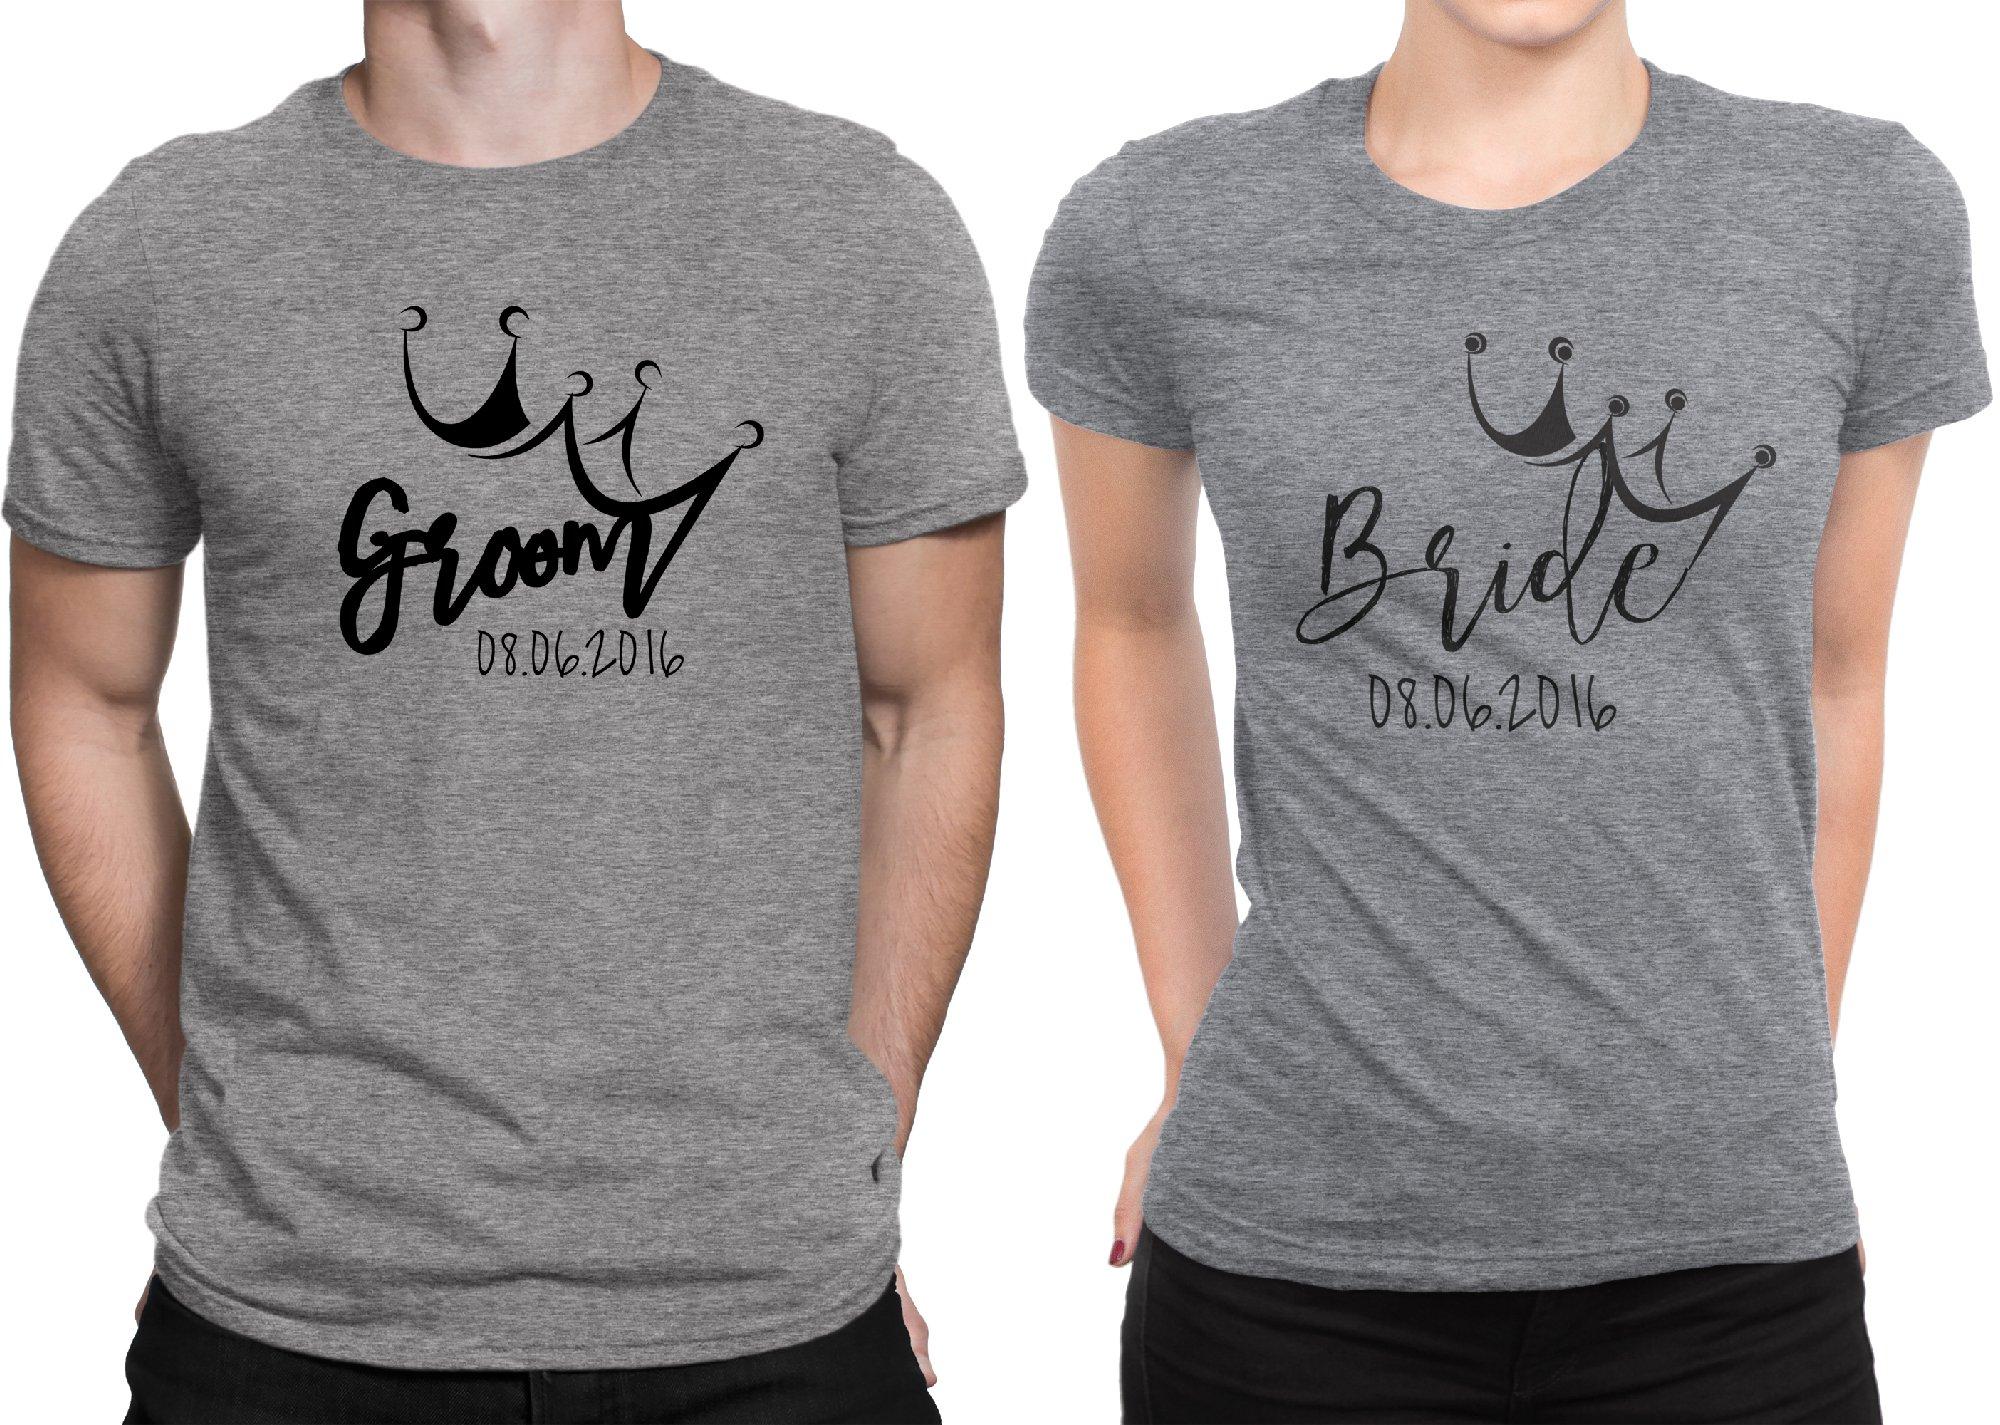 Groom Bride Crown Newly Married Couple Matching T-shirt Honeymoon valentines Men Large / Women X-Large   Deep Heather - Deep Heather